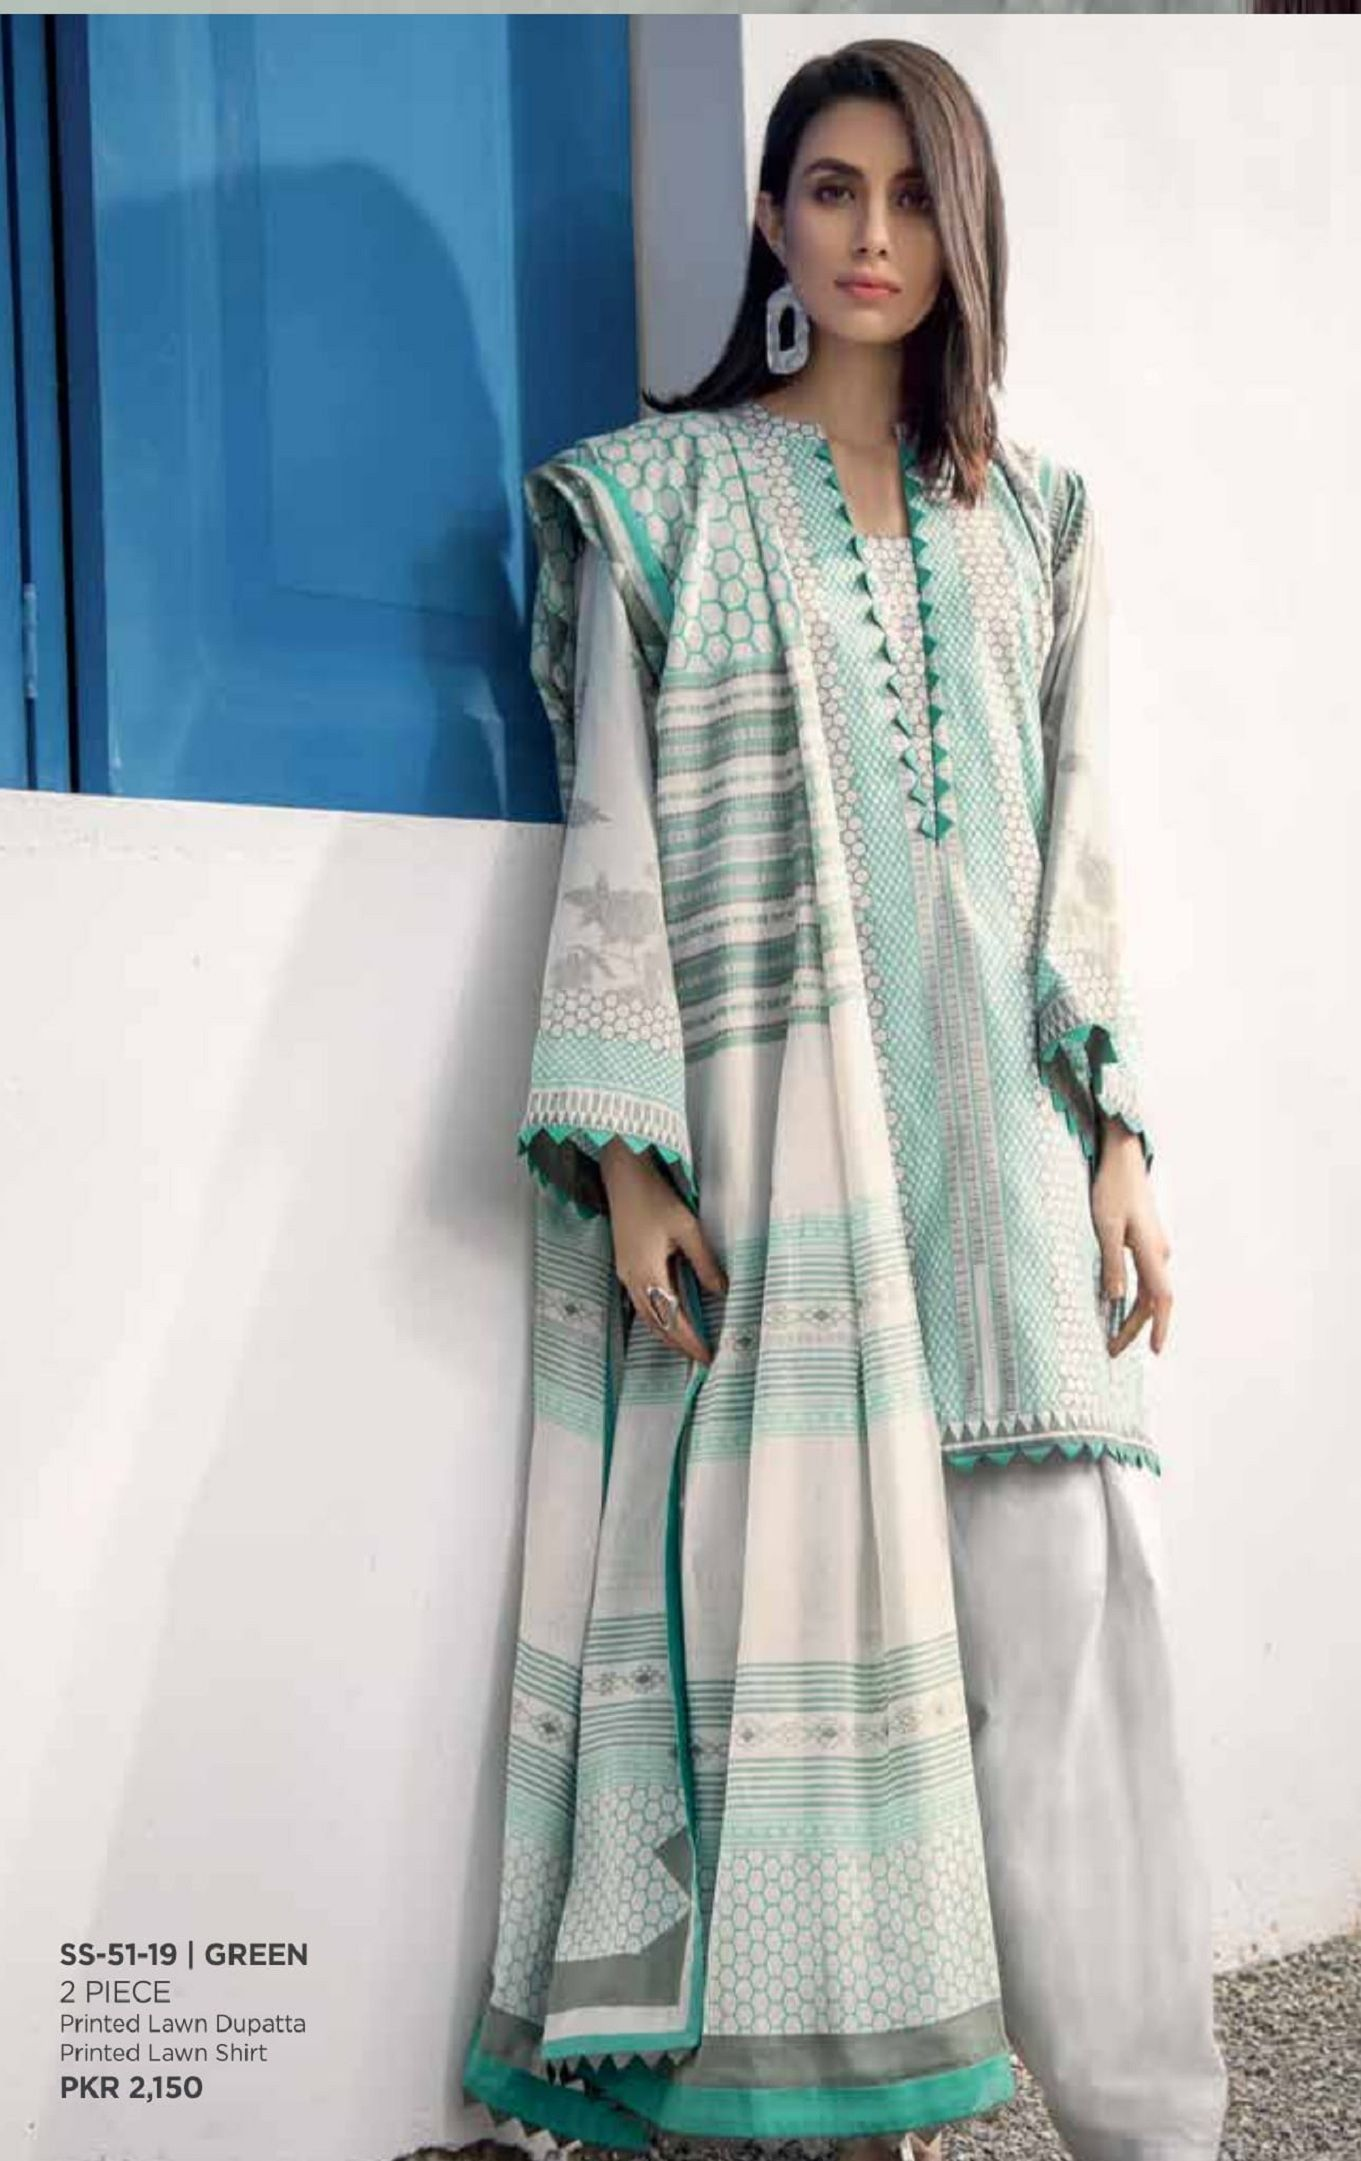 ceb492d07d Alkaram Spring Summer Collection Original Pakistani Suit SS-51-19 (Green)